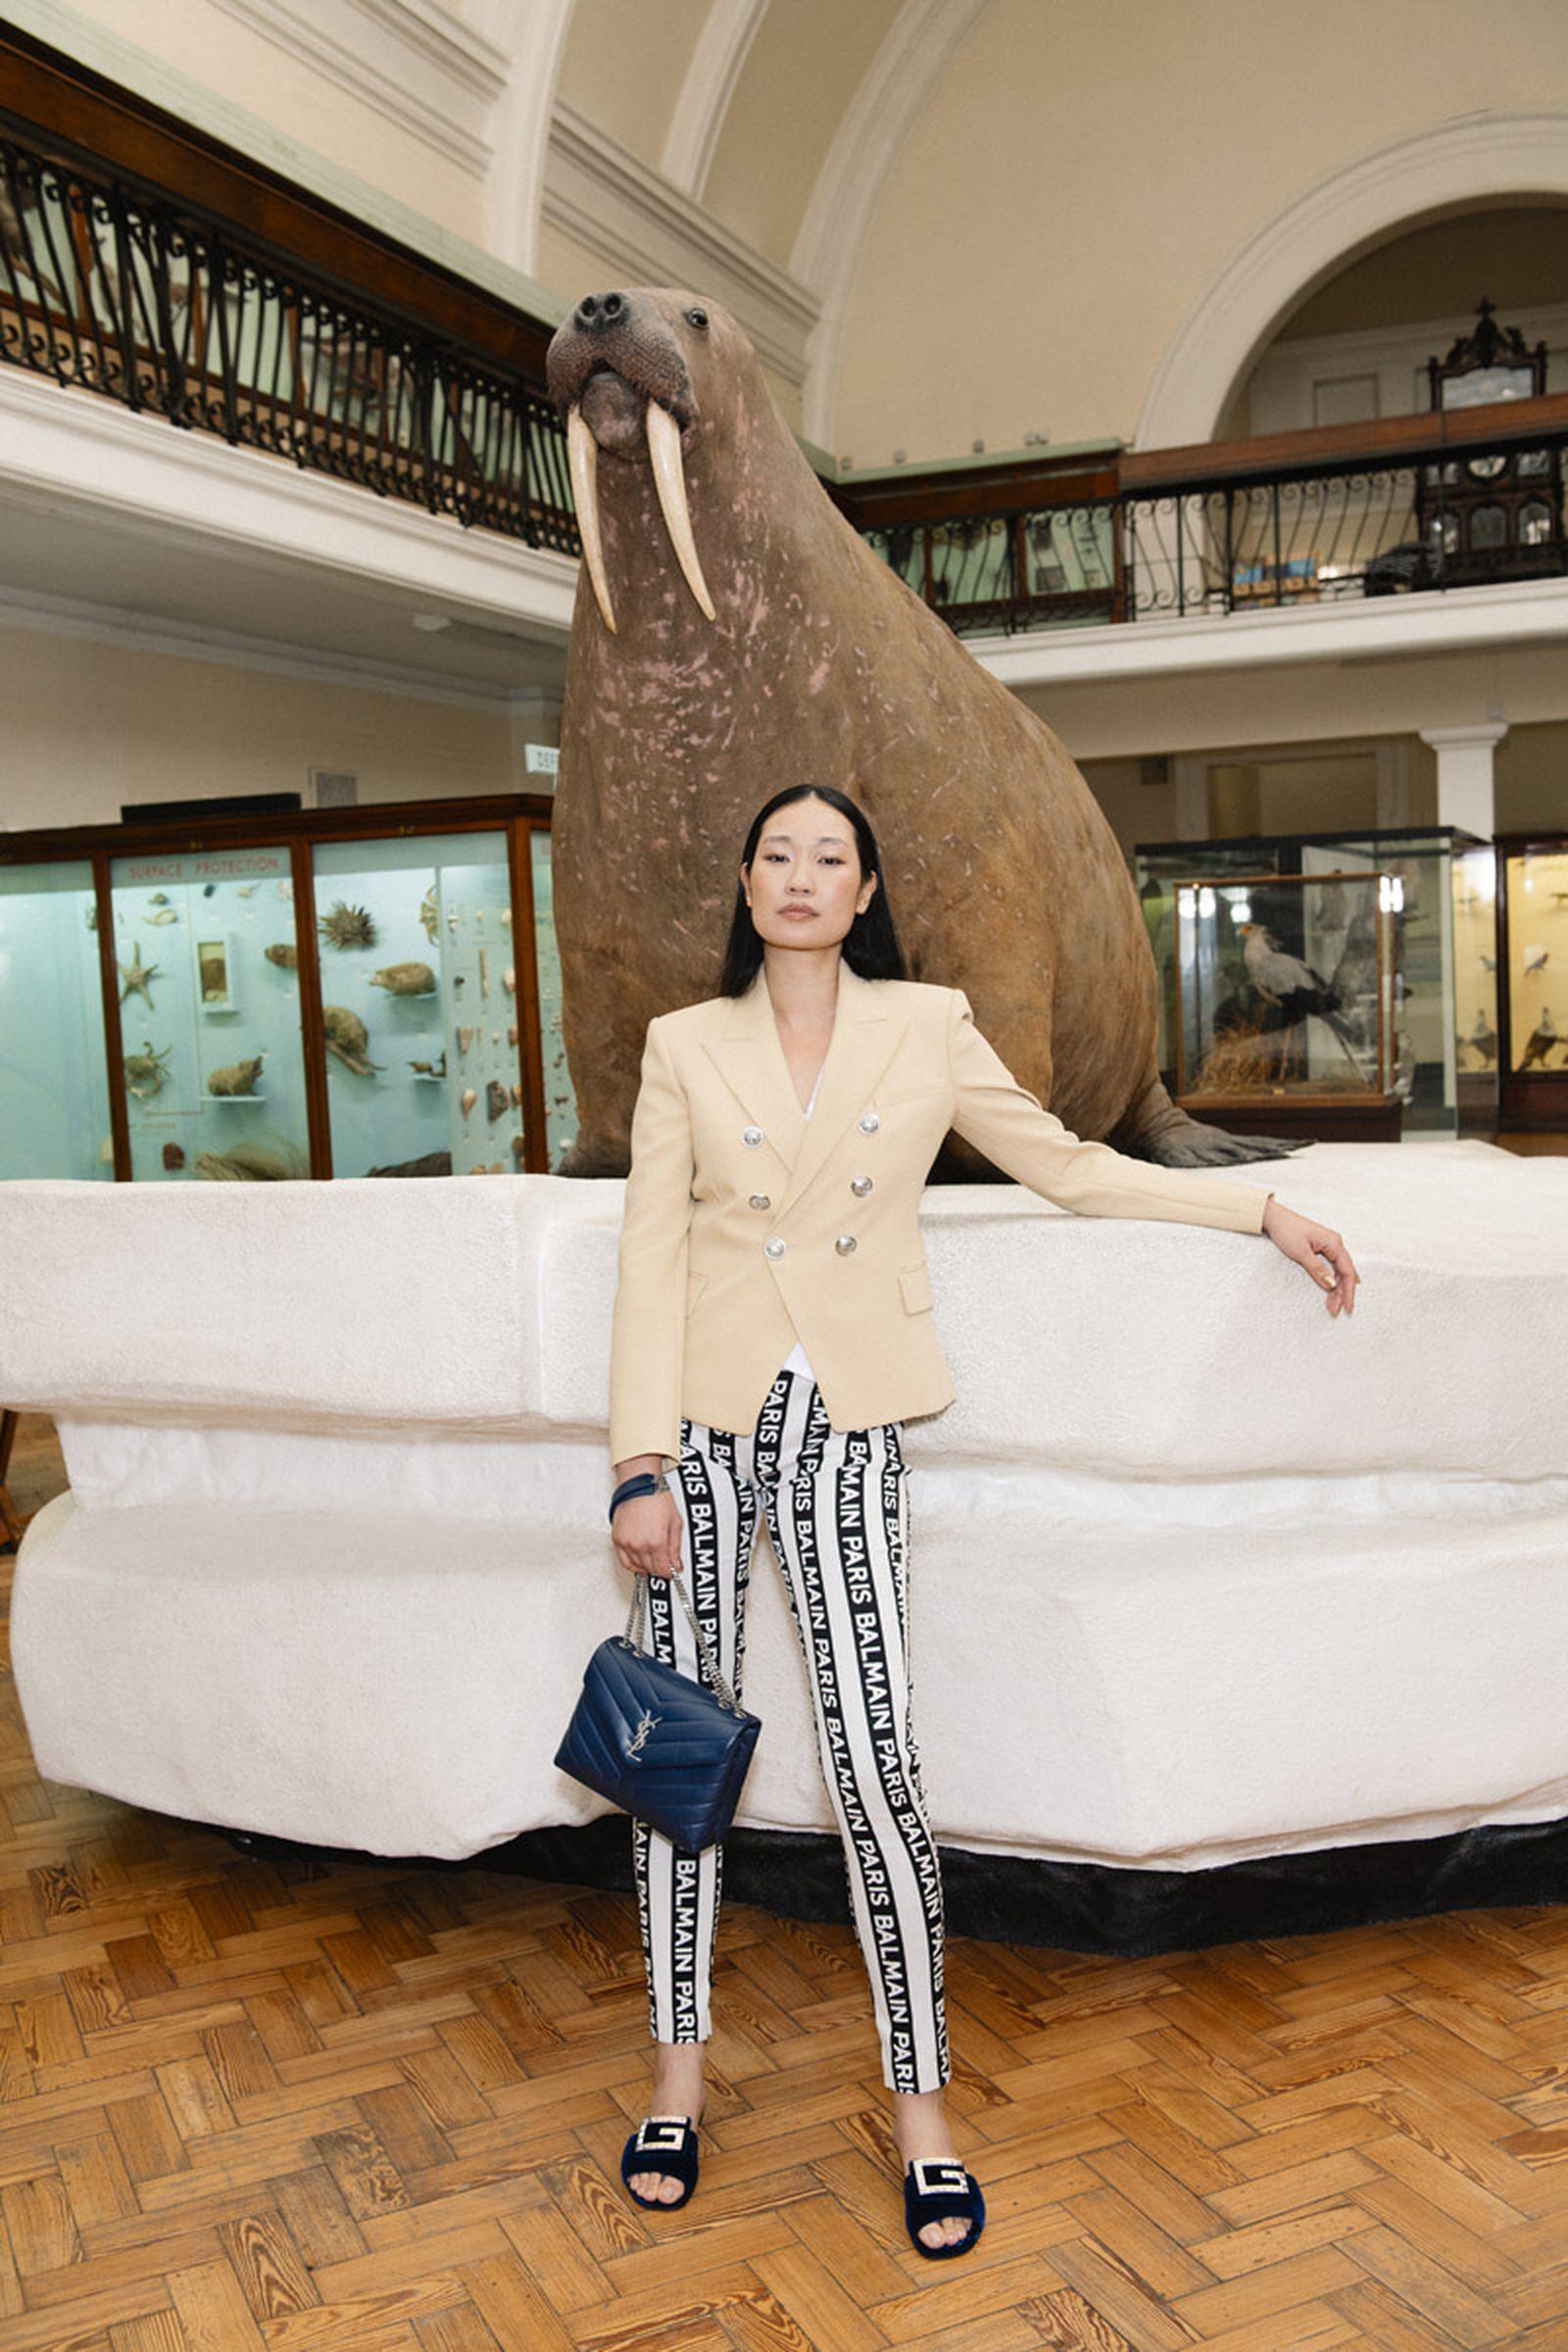 flannels-biggest-luxury-retailer-youve-never-heard-of-06